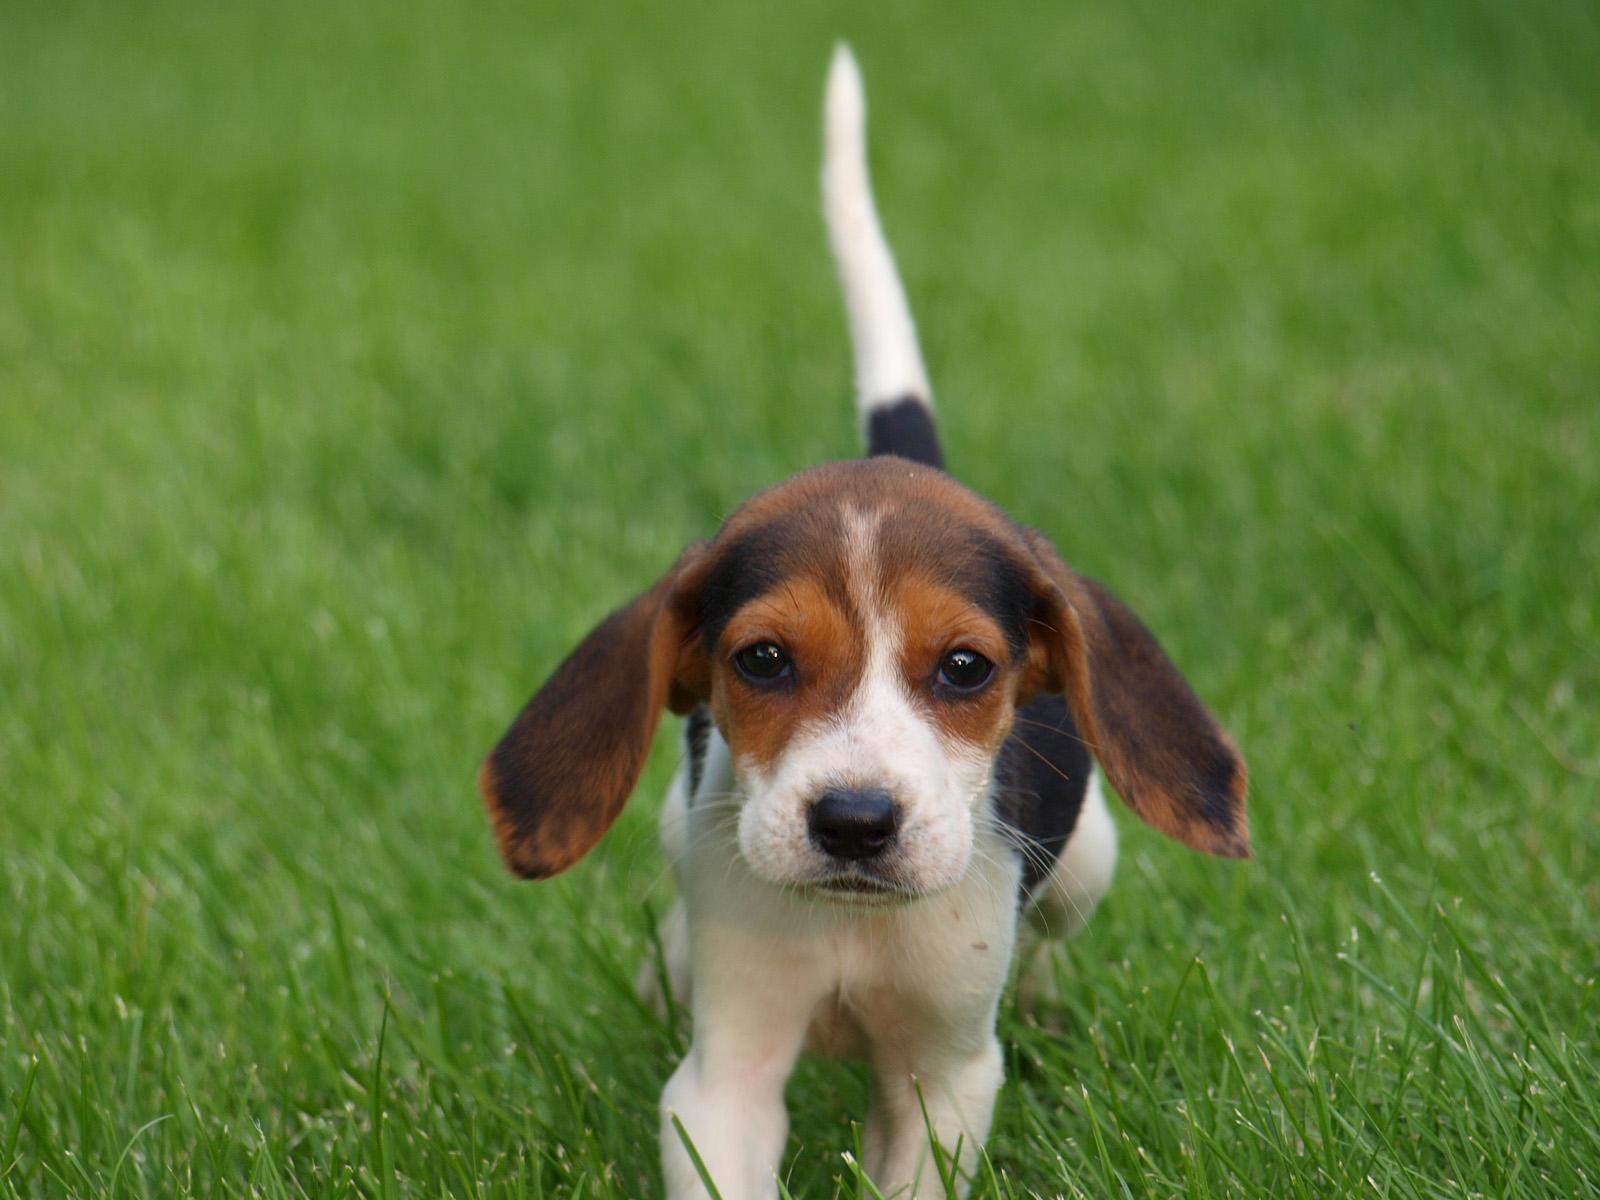 Dog adoption in caledon ontario inside caledon ontario 4leggedlove puppy m4hsunfo